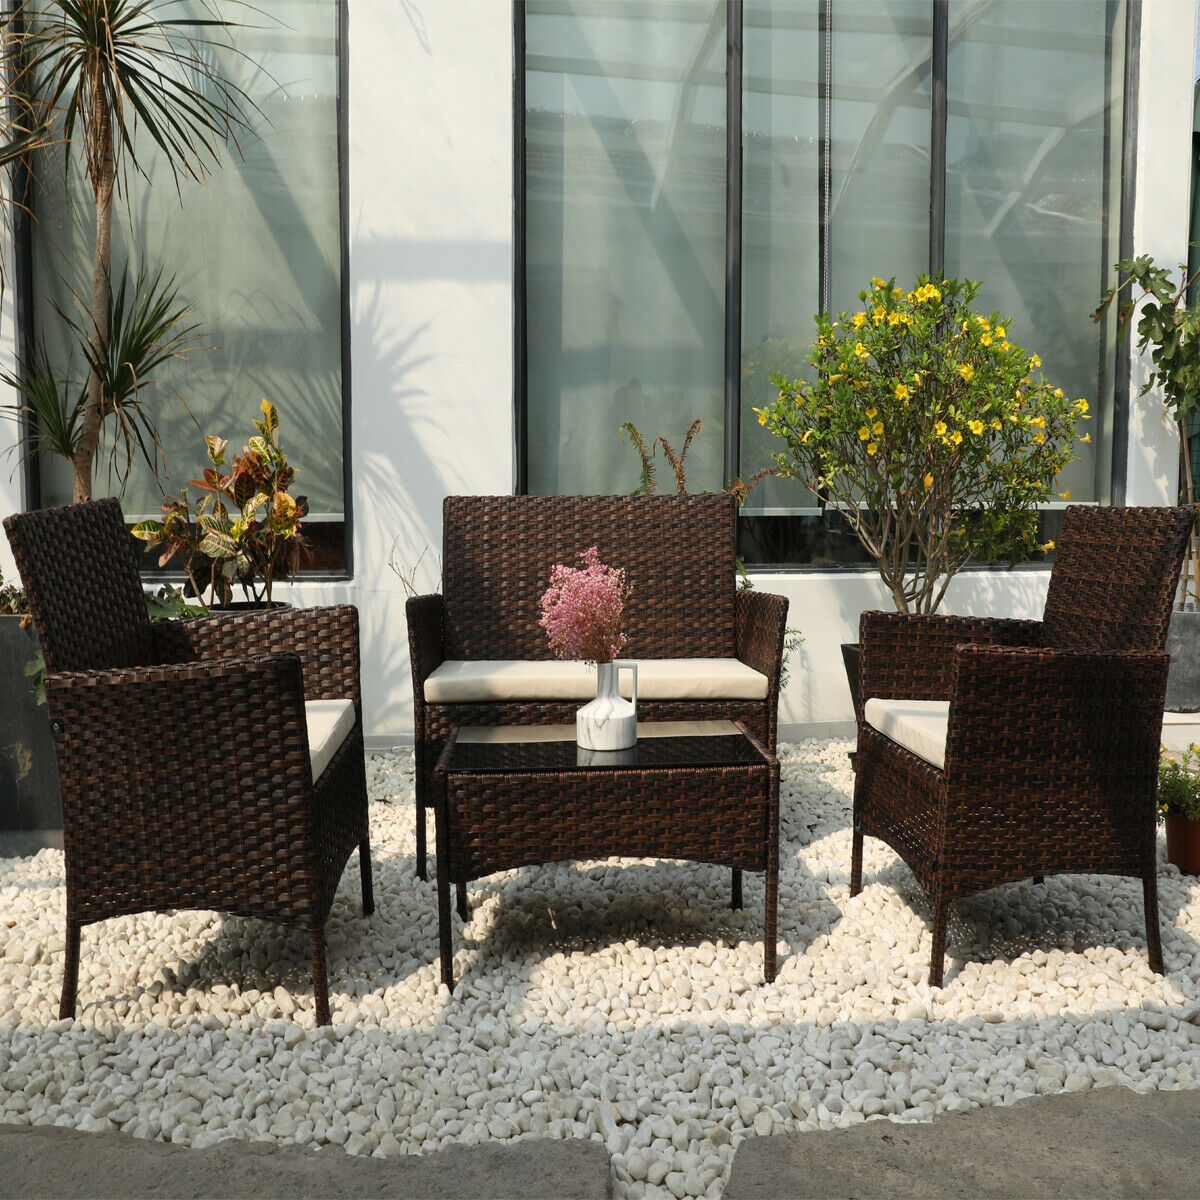 Garden Furniture - DIMAR garden 4 Piece Outdoor Rattan Patio Furniture Sectional Chair Mix Brown